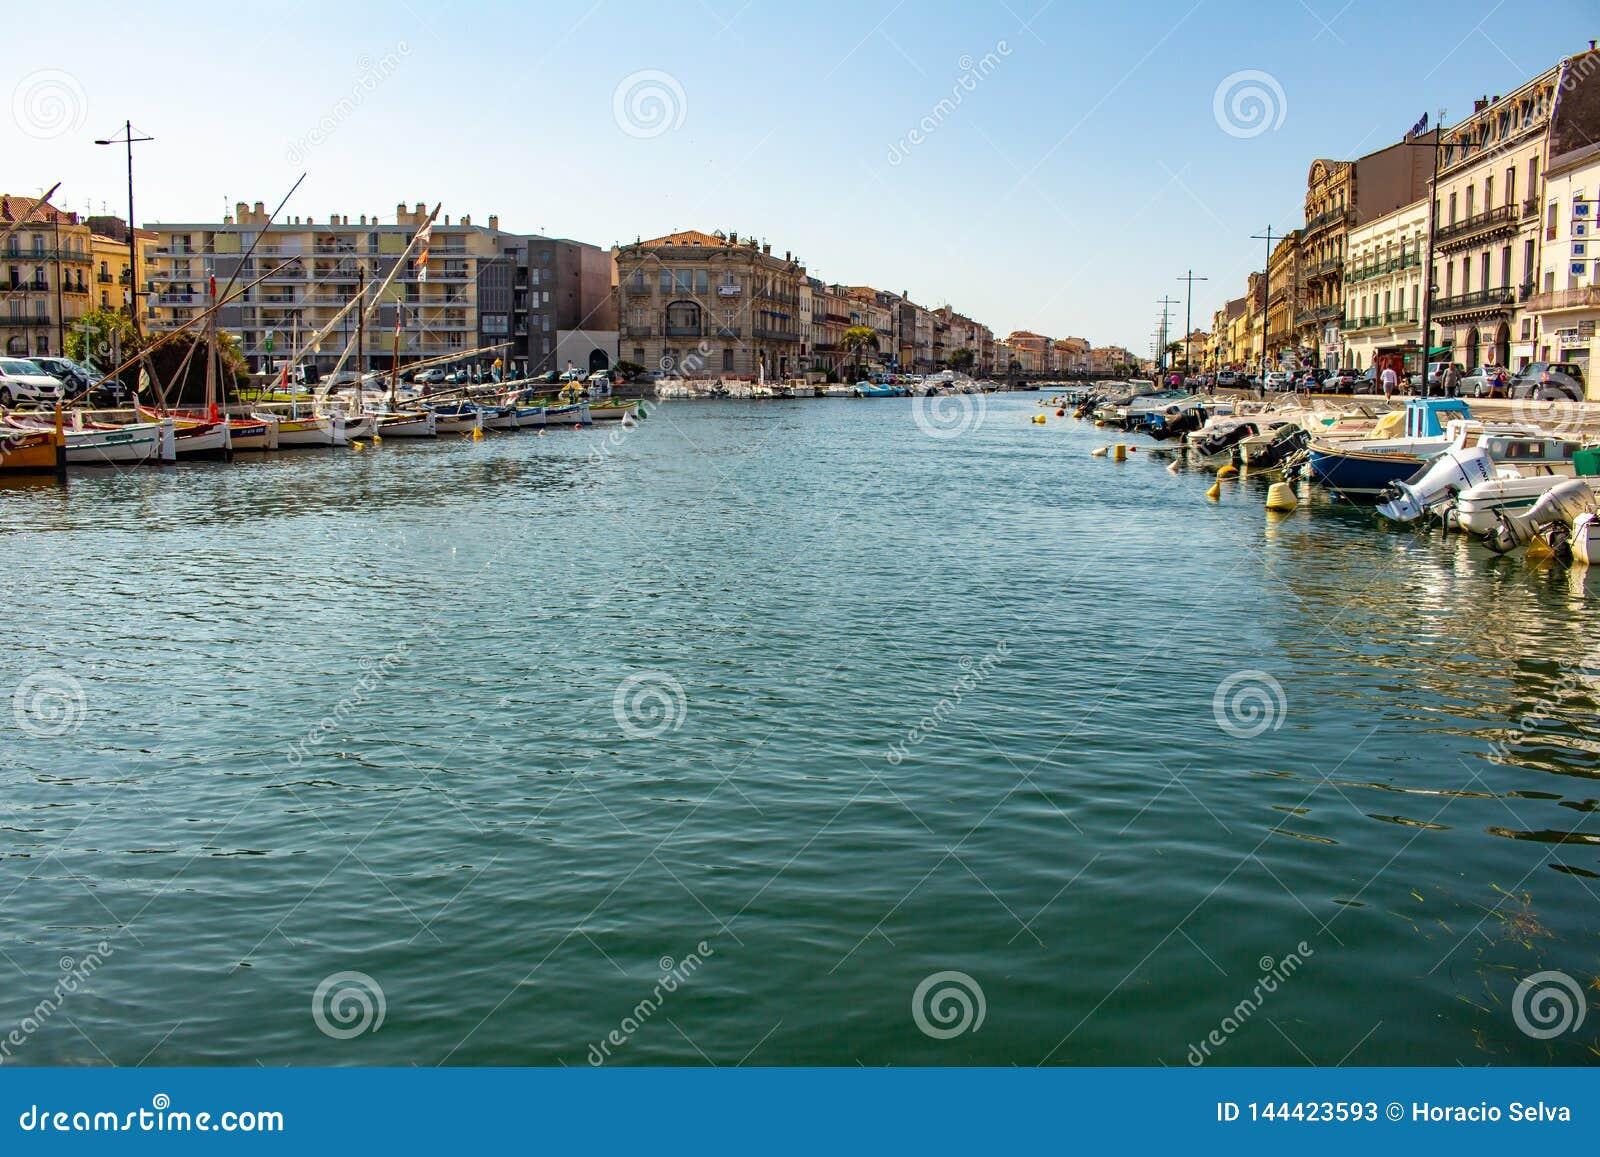 Sete, Γαλλία στις 20 Μαΐου 2018 Κτήρια αναγέννησης δίπλα στα νερά των καναλιών της πόλης που εποικείται με τις μικρές βάρκες